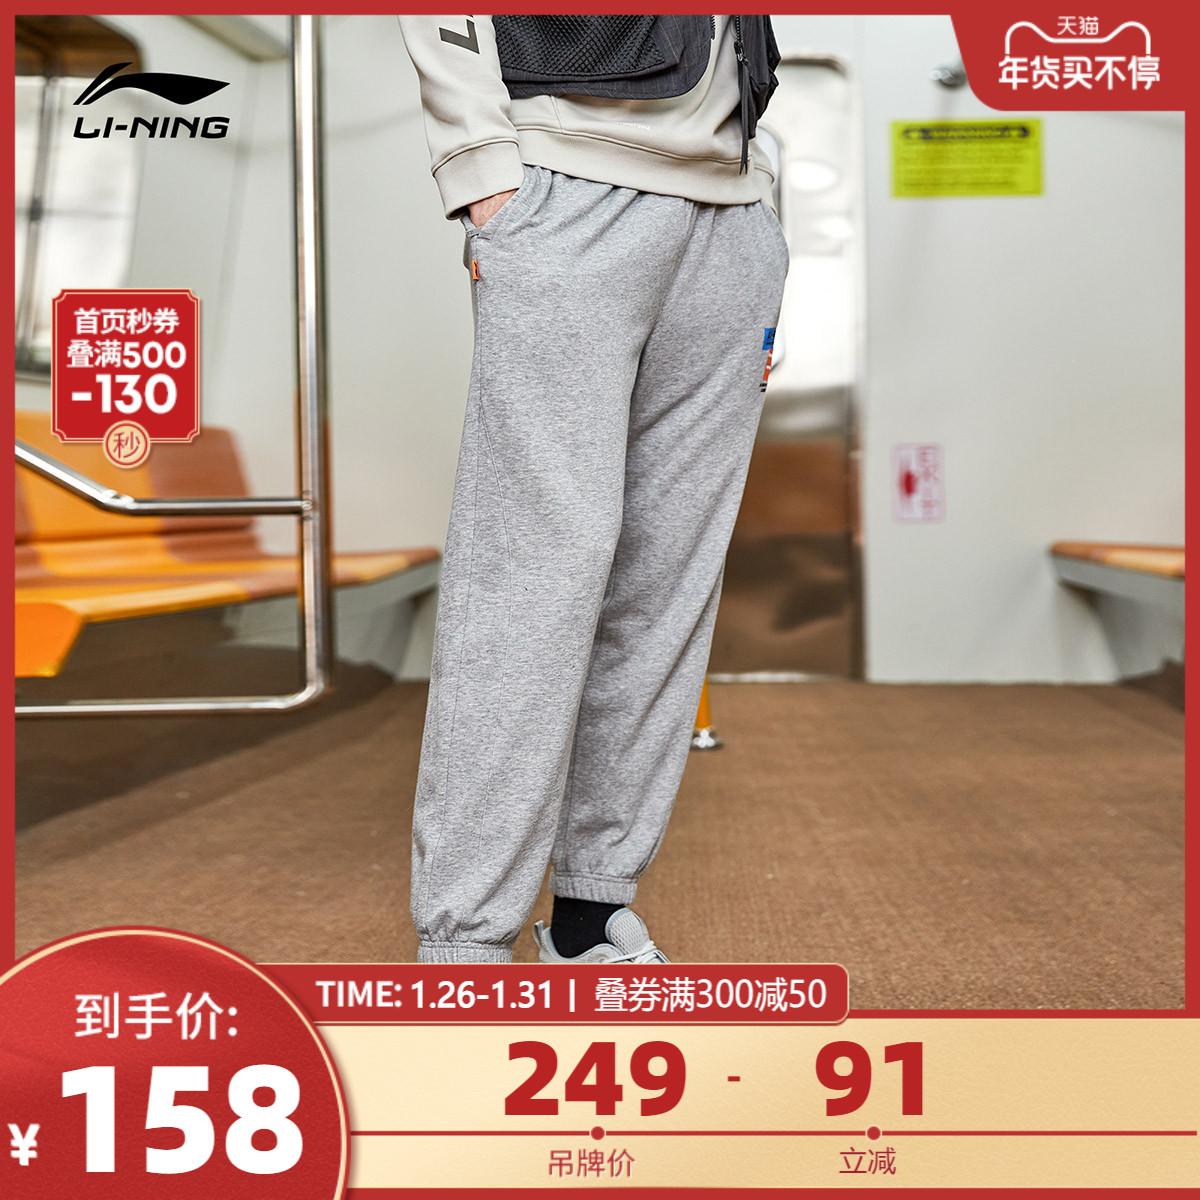 Li Ningwei pants mens official 2021 new spring size casual gray nine-point pants mens sports pants